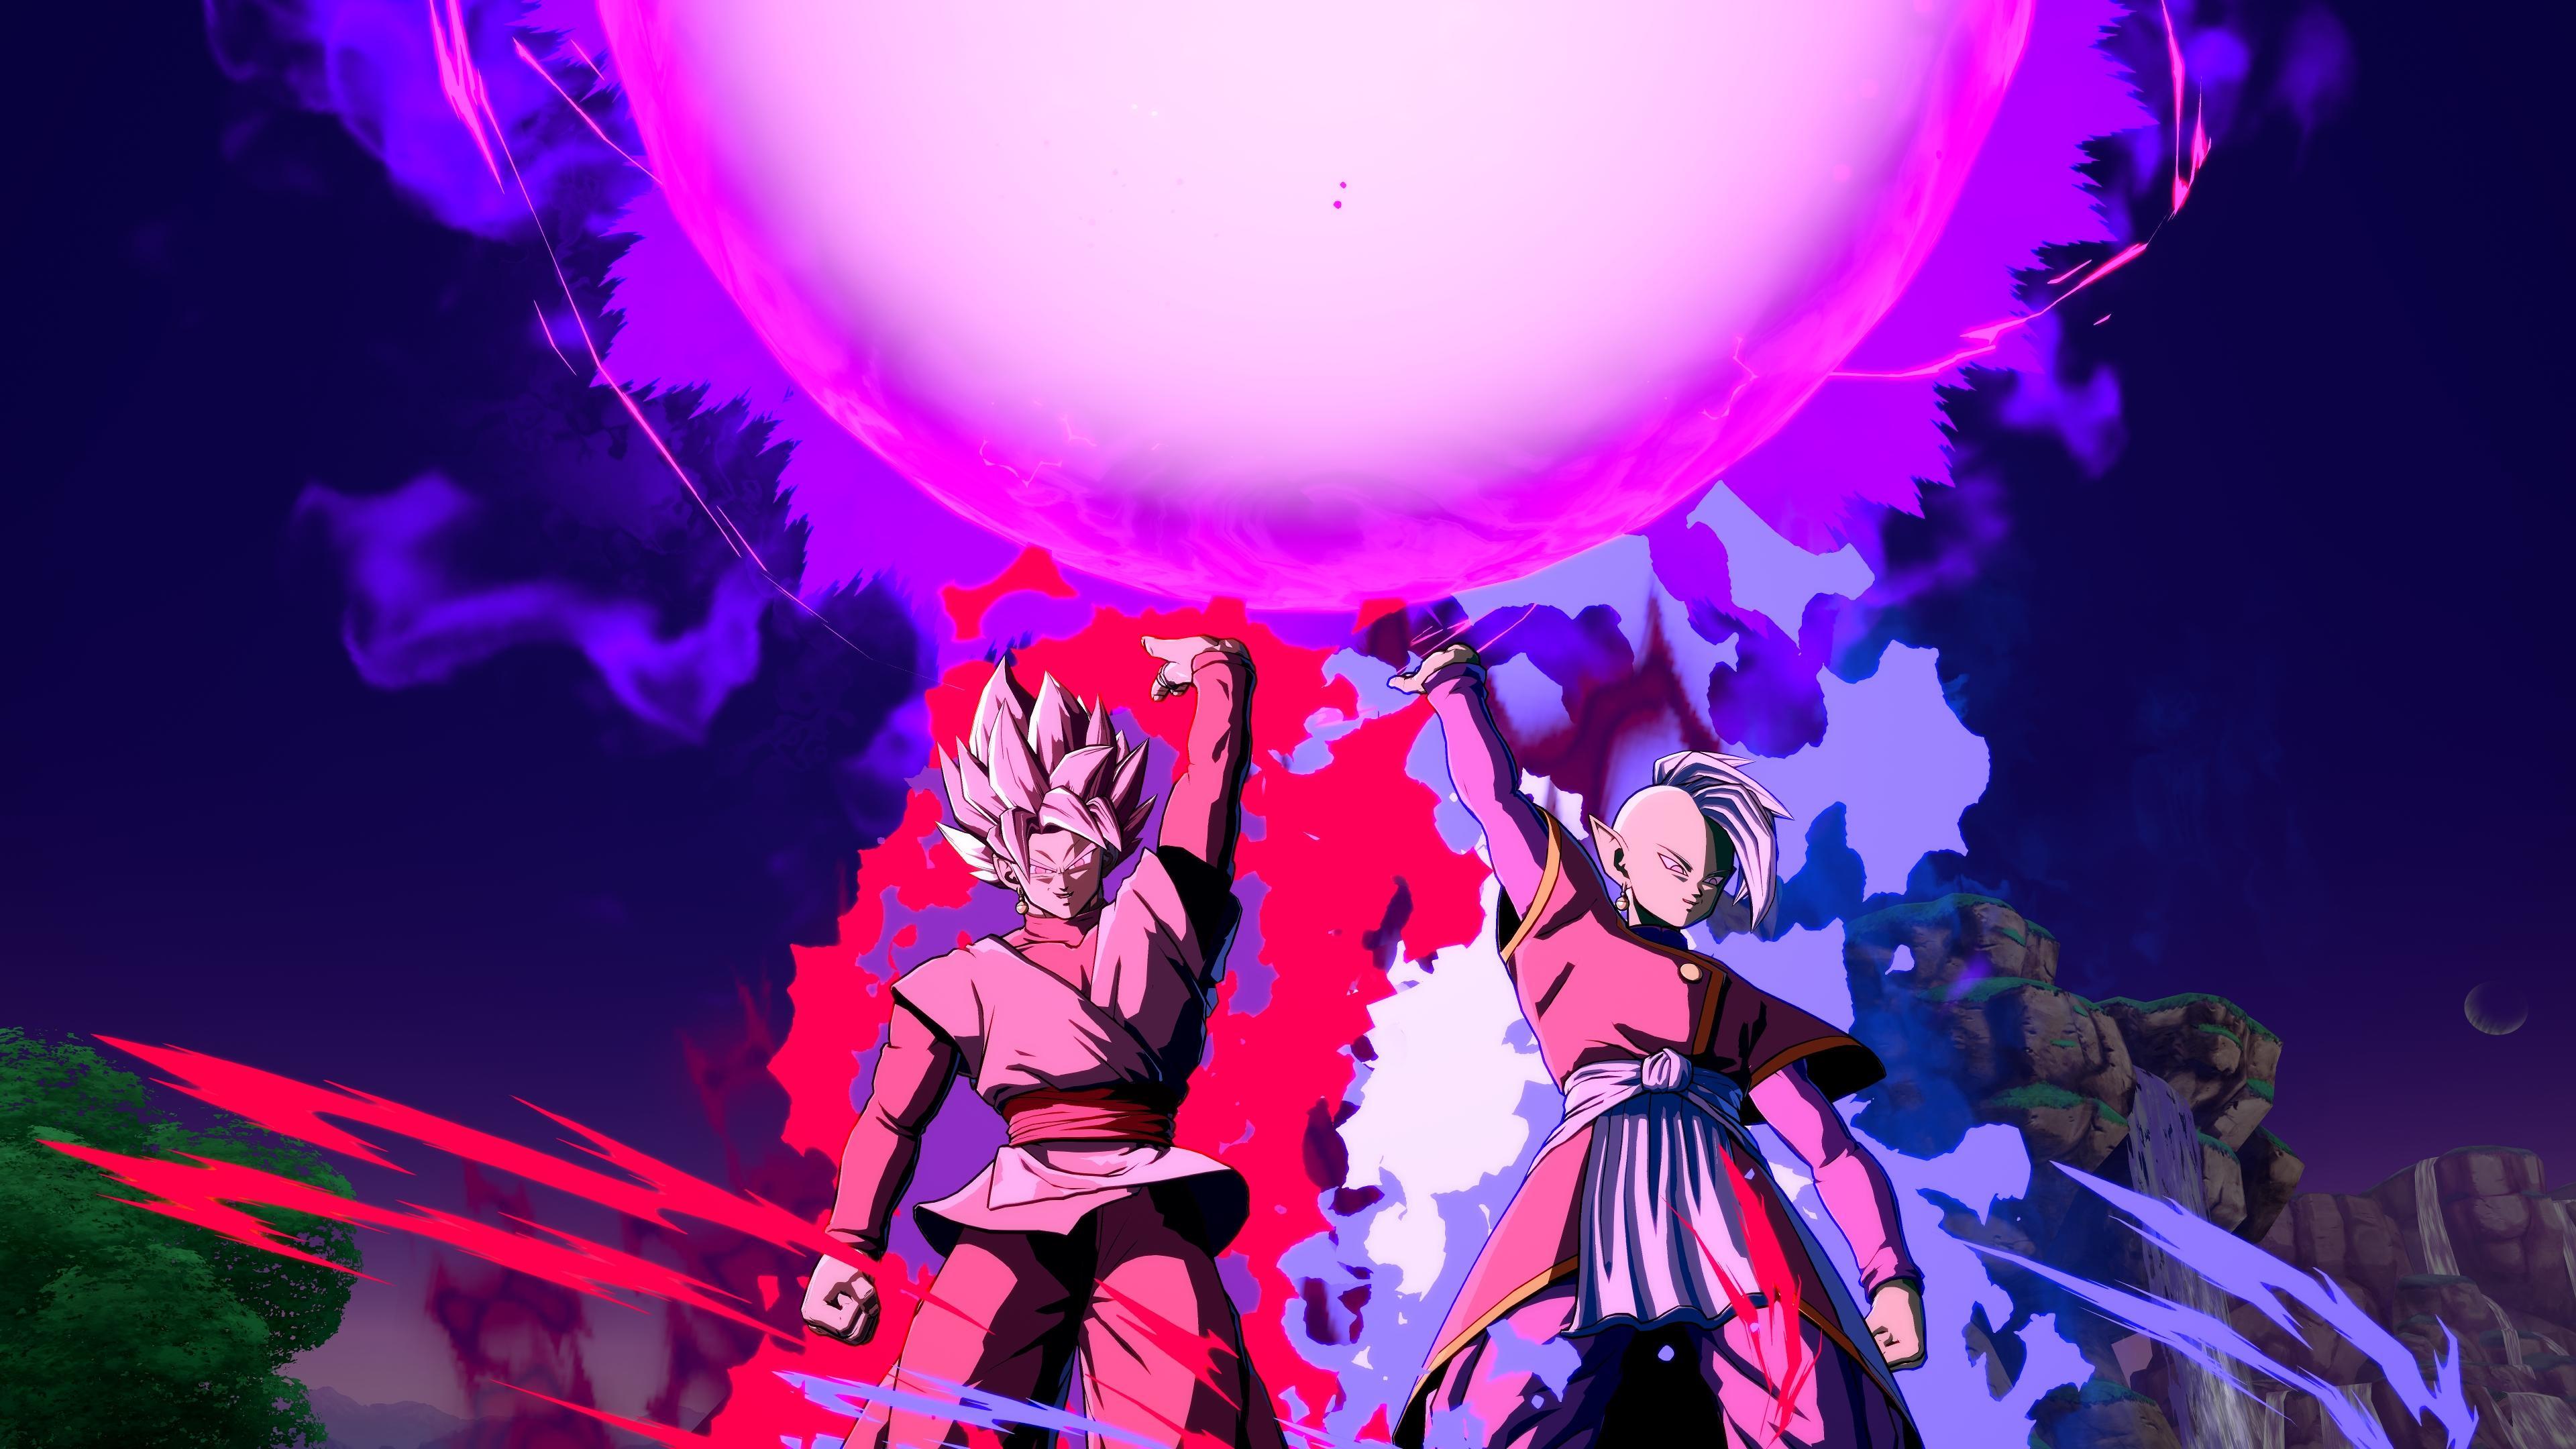 Goku Black Wallpapers Top Free Goku Black Backgrounds